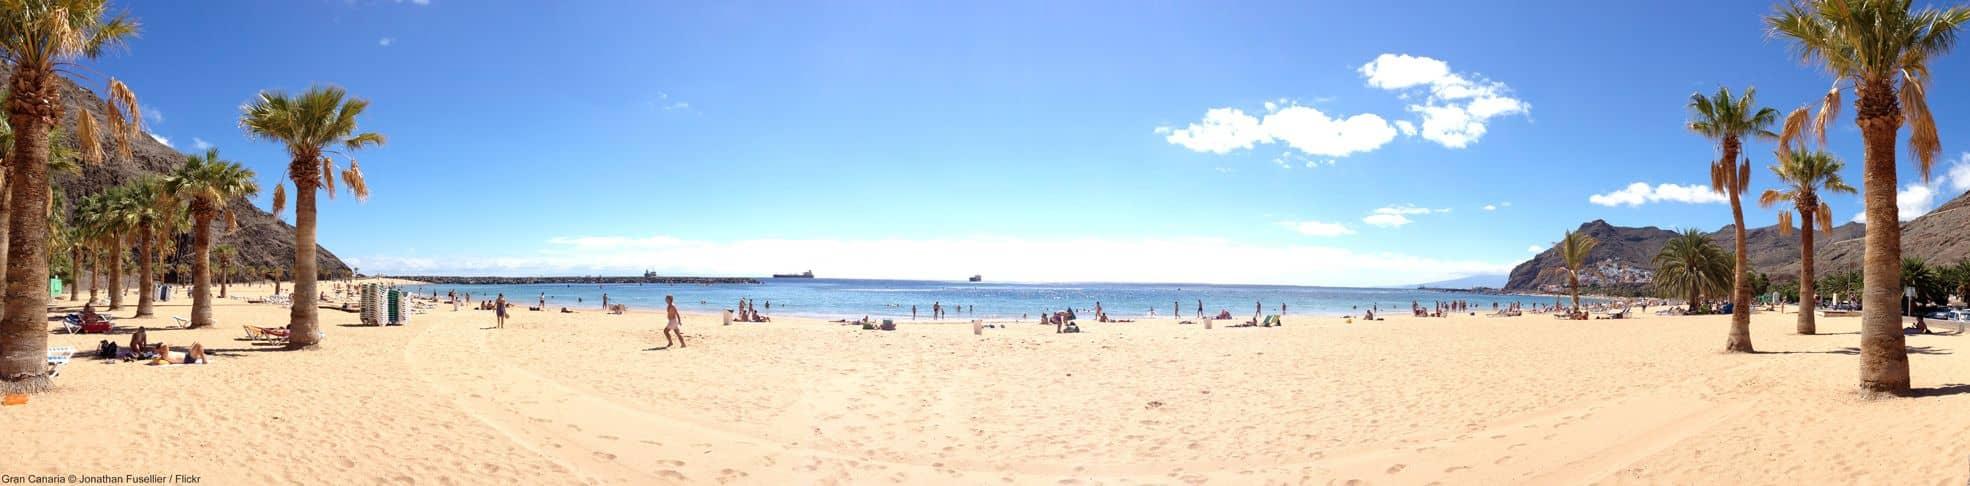 Cheap Playa De Las Americas Holidays 2020 2021 From 163 49